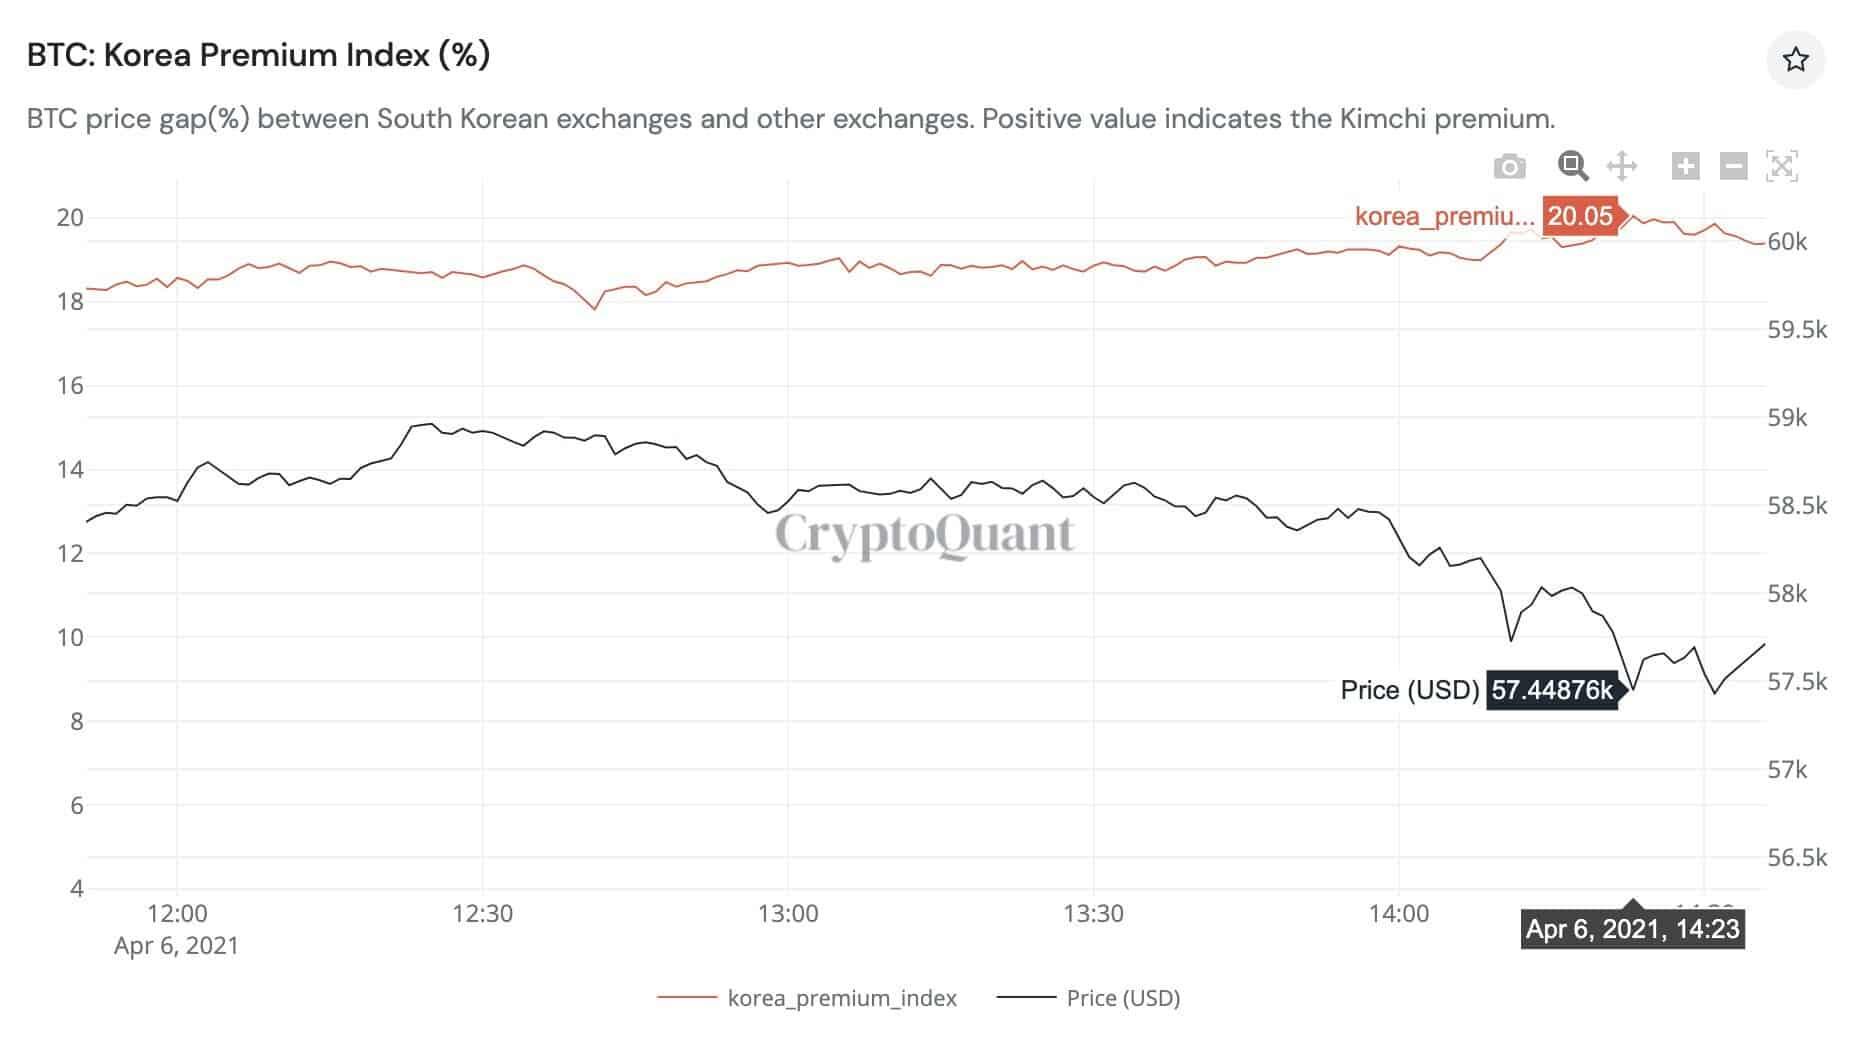 Bitcoin Kimchi Premium Yearly High. Source: CryptoQuant